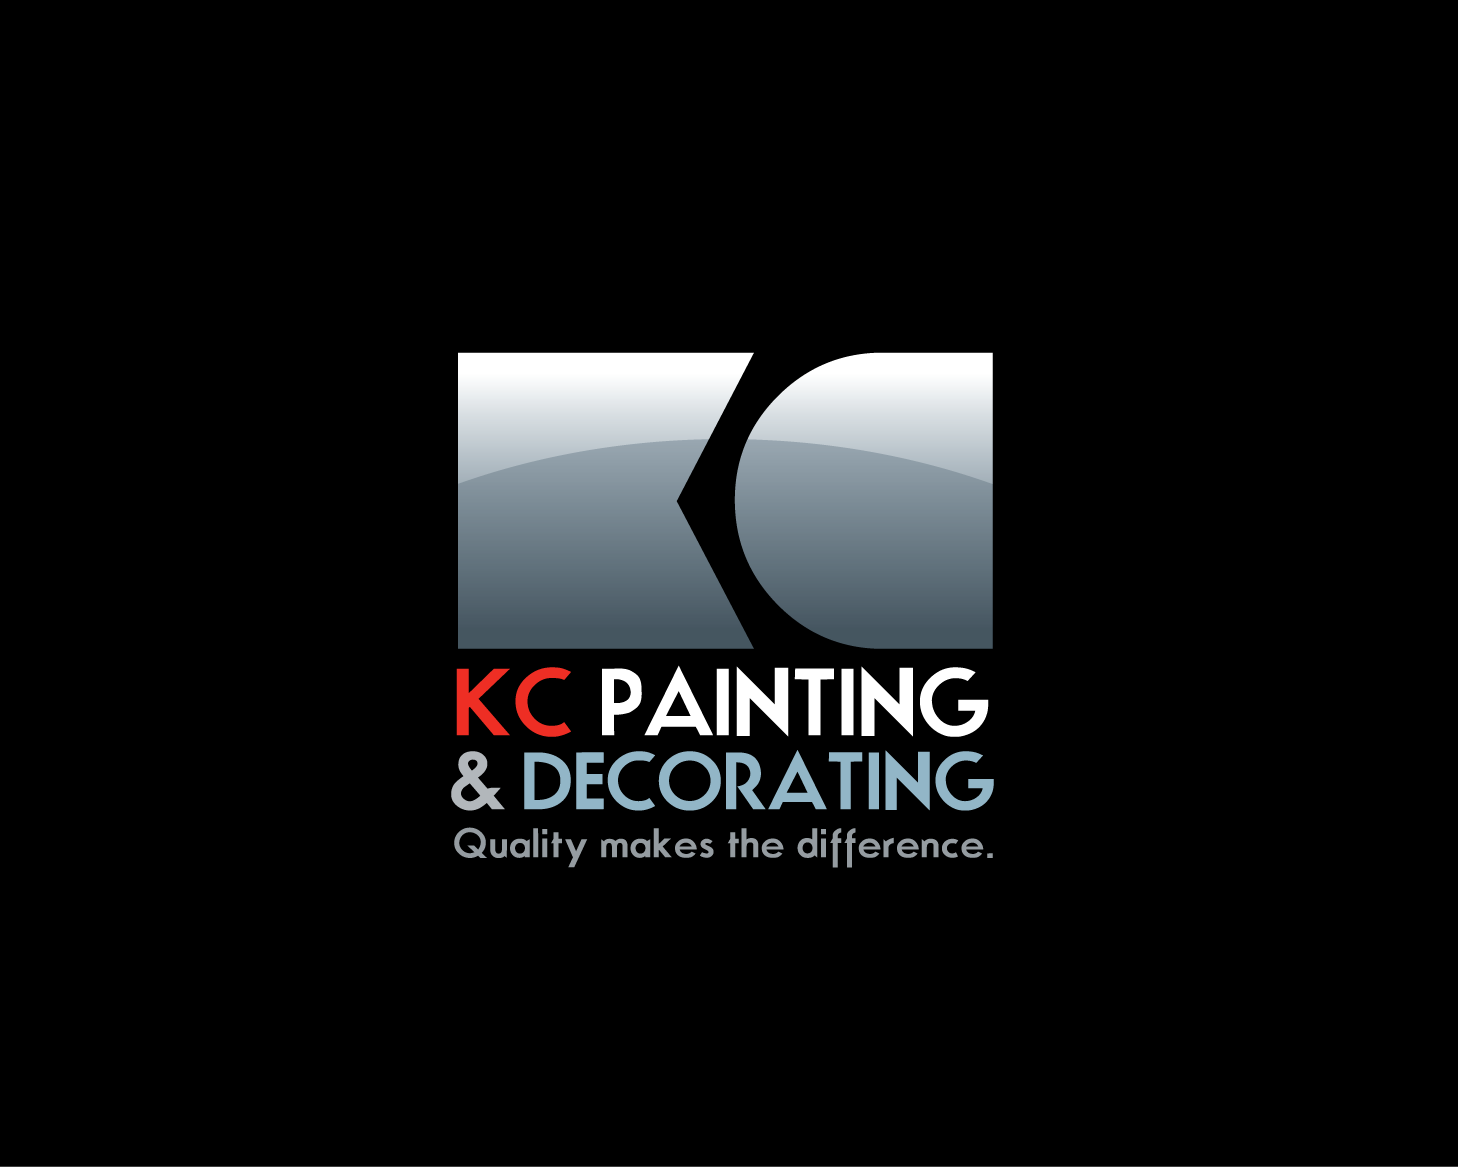 Kc painting decorating logo development lin wilde for Painting decorating logos